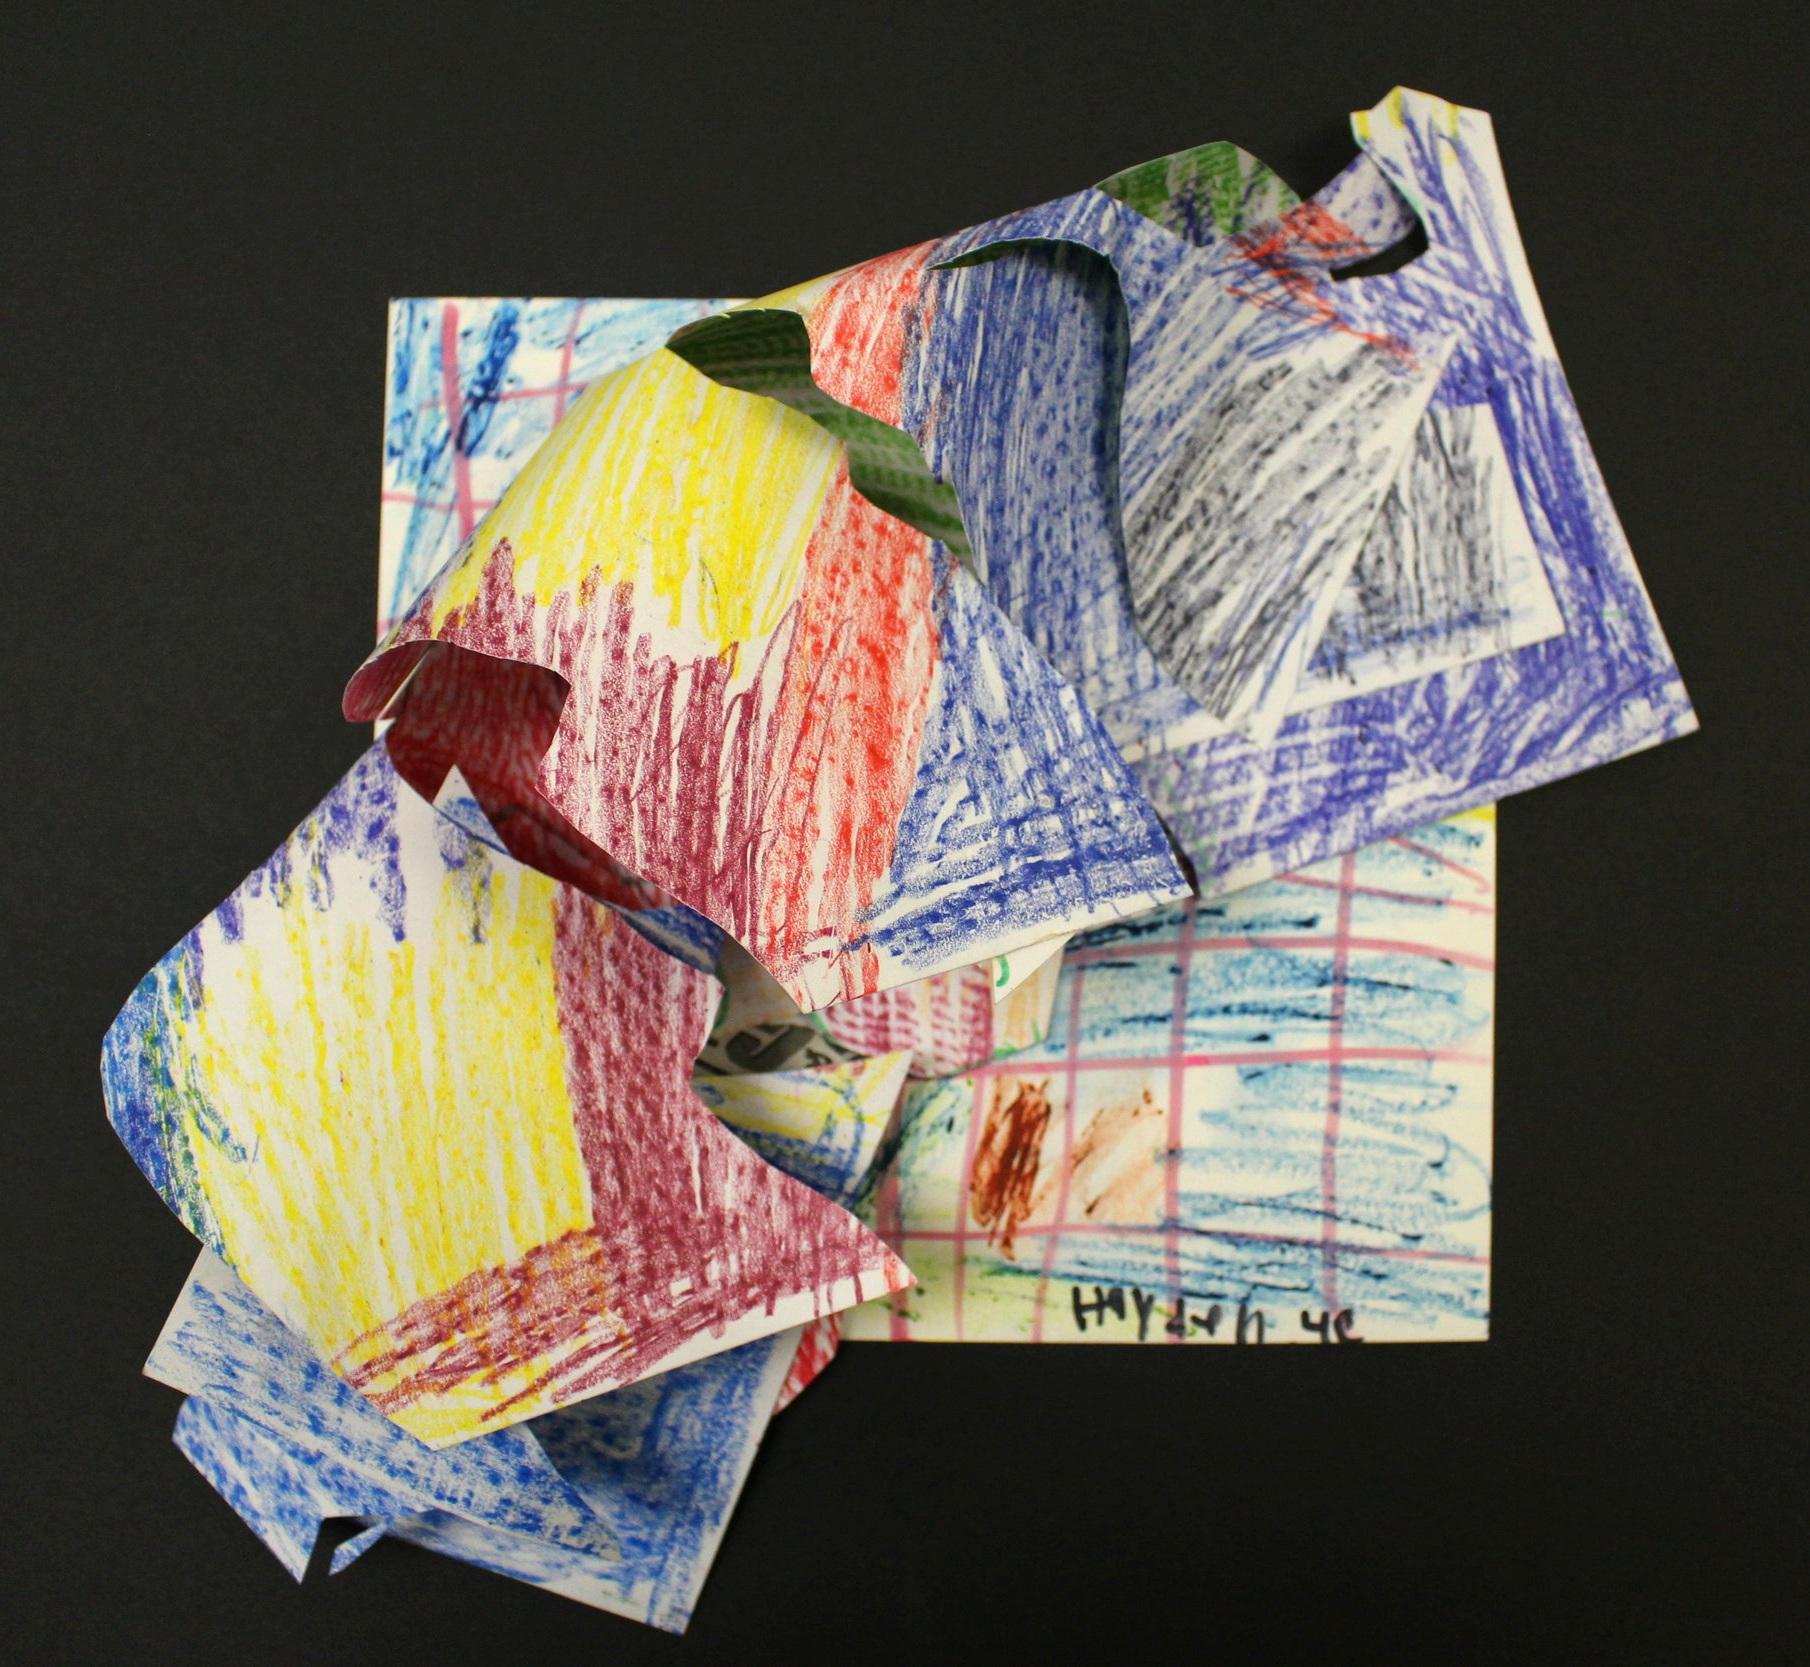 Grade 4: Hayden B. - Frank Stella Inspired Relief Sculpture